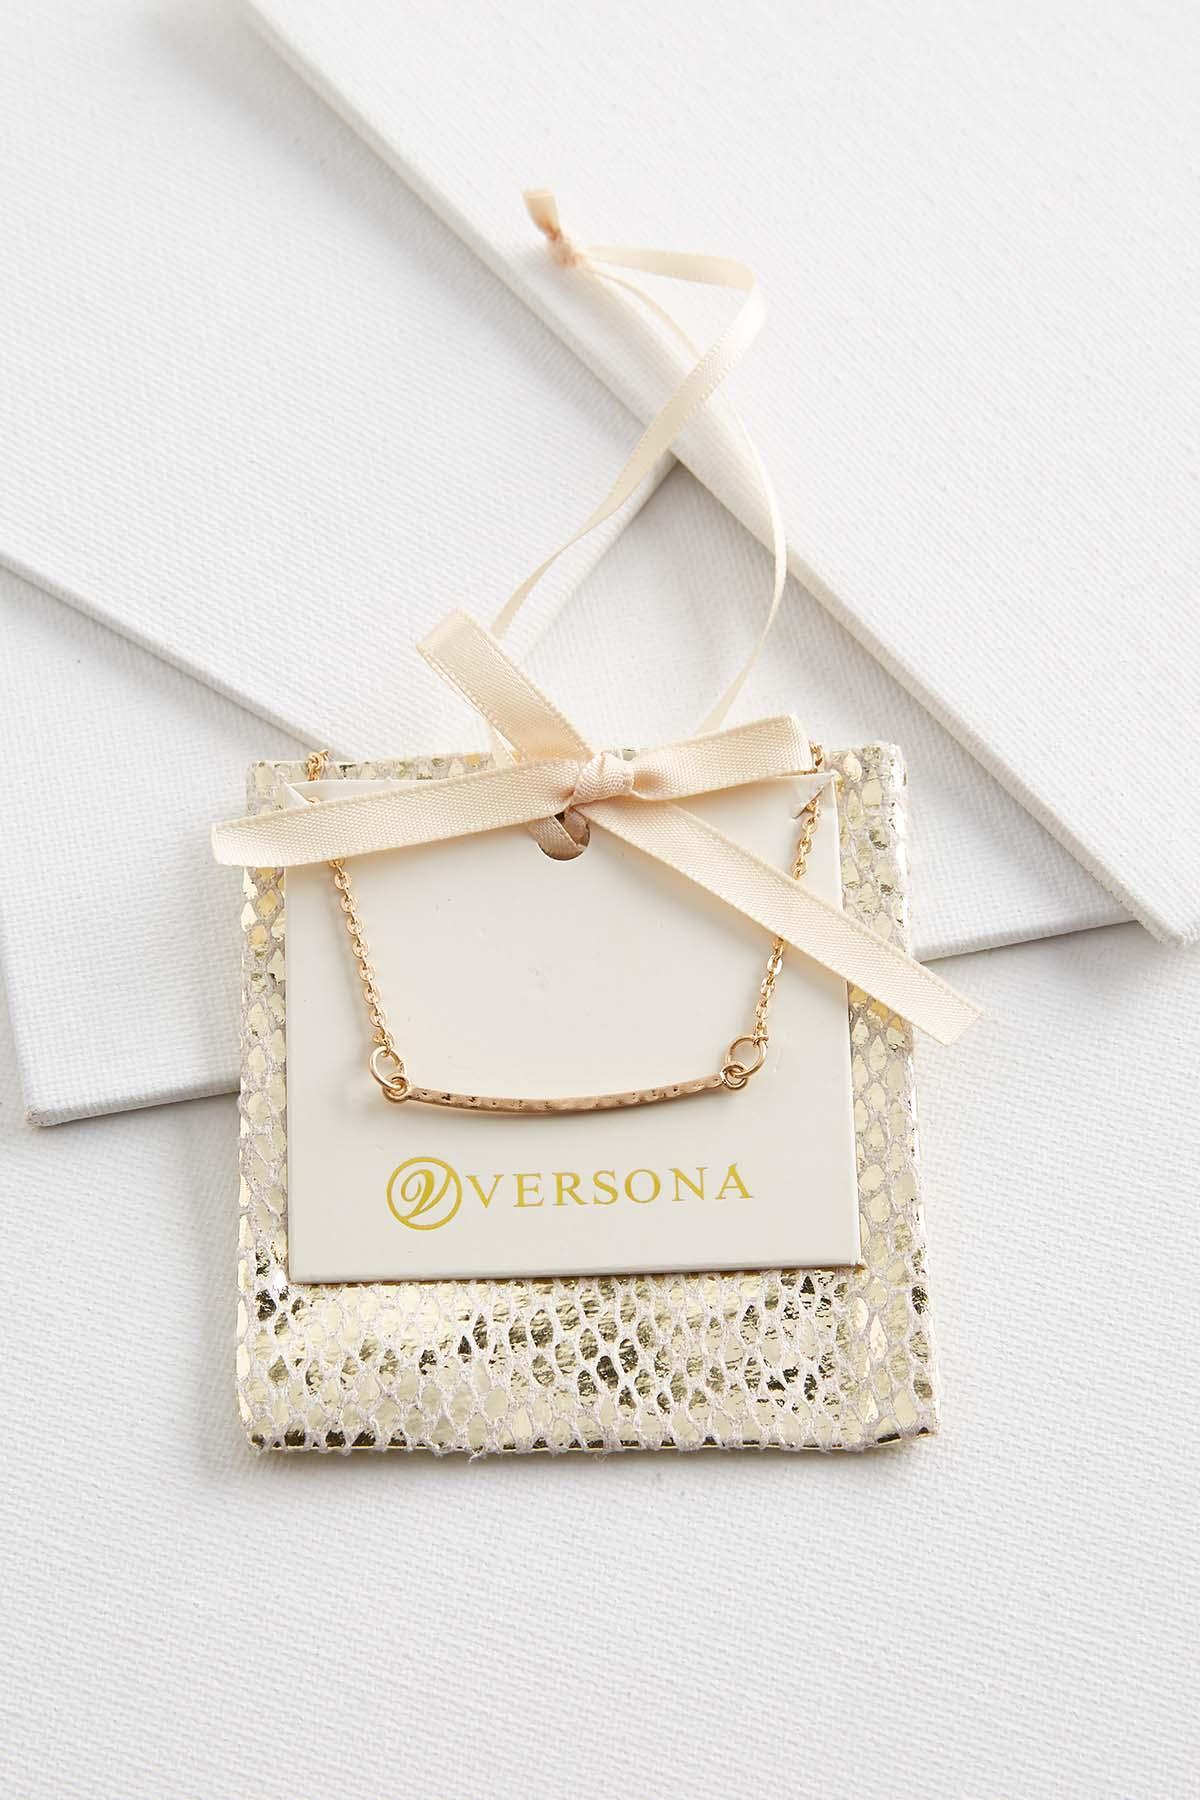 Bar Pendant Necklace Gift Ornament